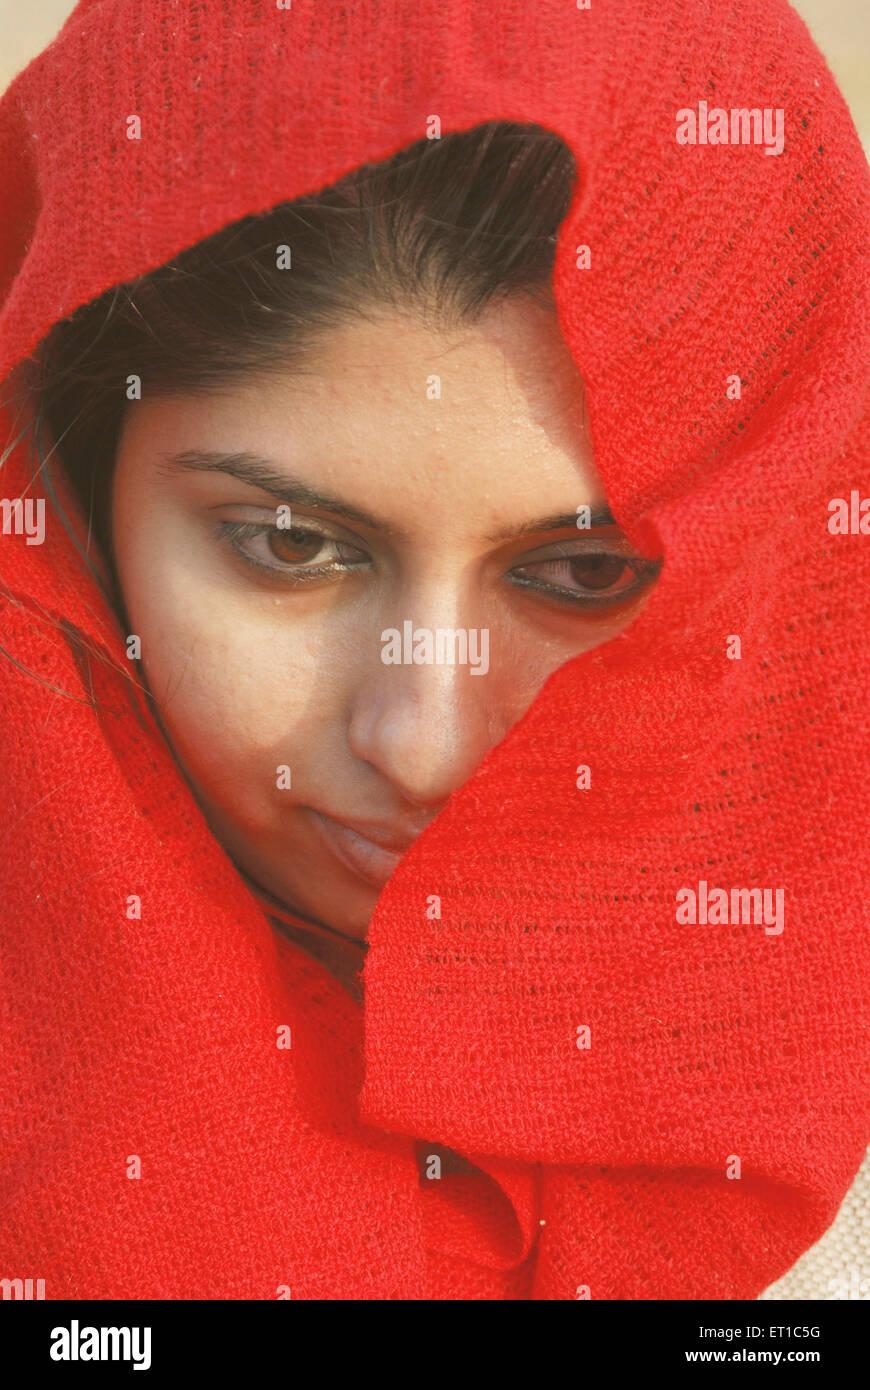 Chica con pañuelo rojo ; ; ; Rajasthan India Jaisalmer MR#704 Imagen De Stock